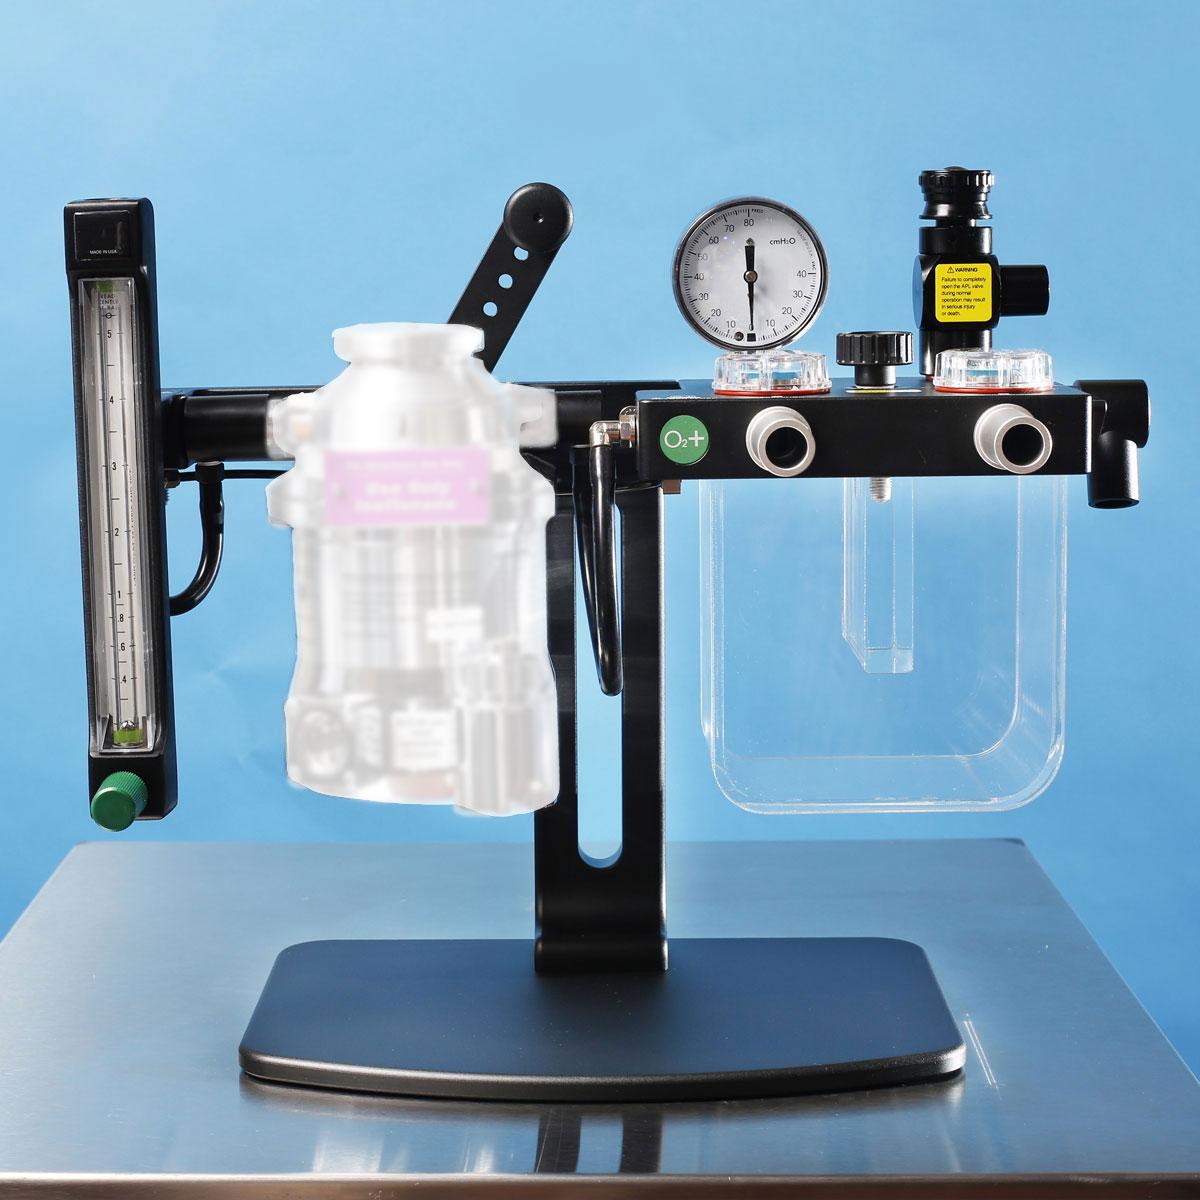 EZ-RB1000NV Veterinary Anesthesia Machine No Vaporizer